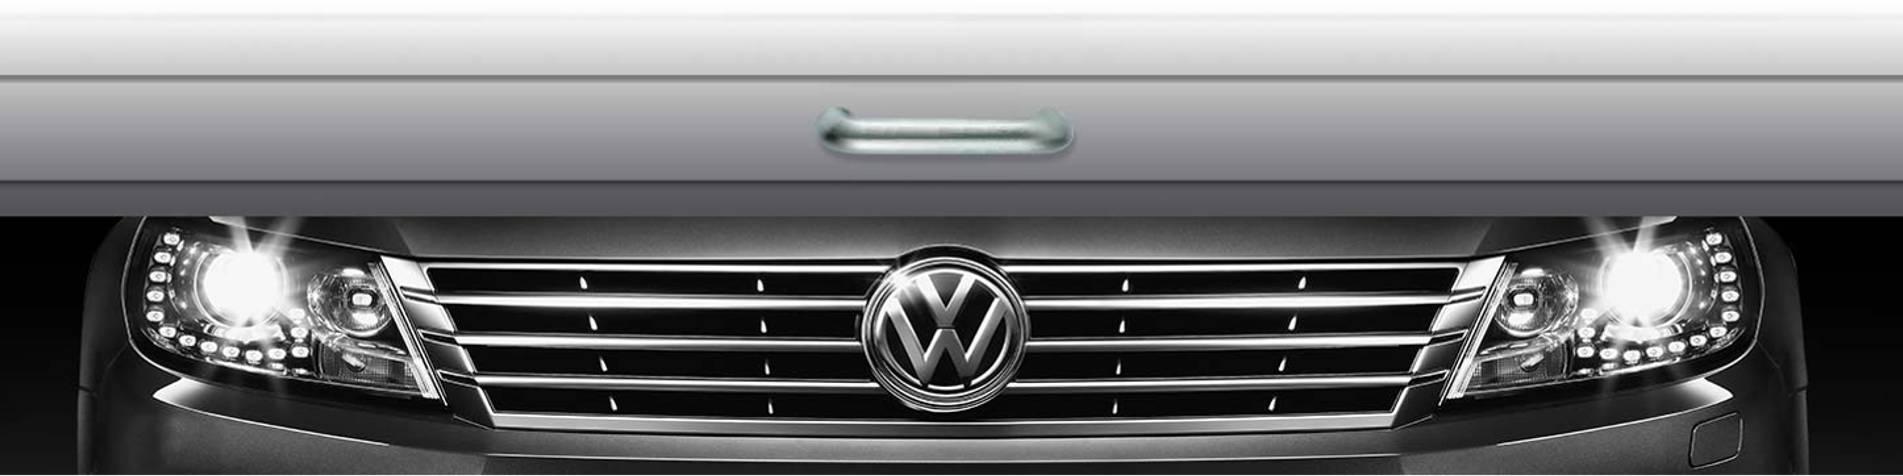 Auto Volkswagen km 0